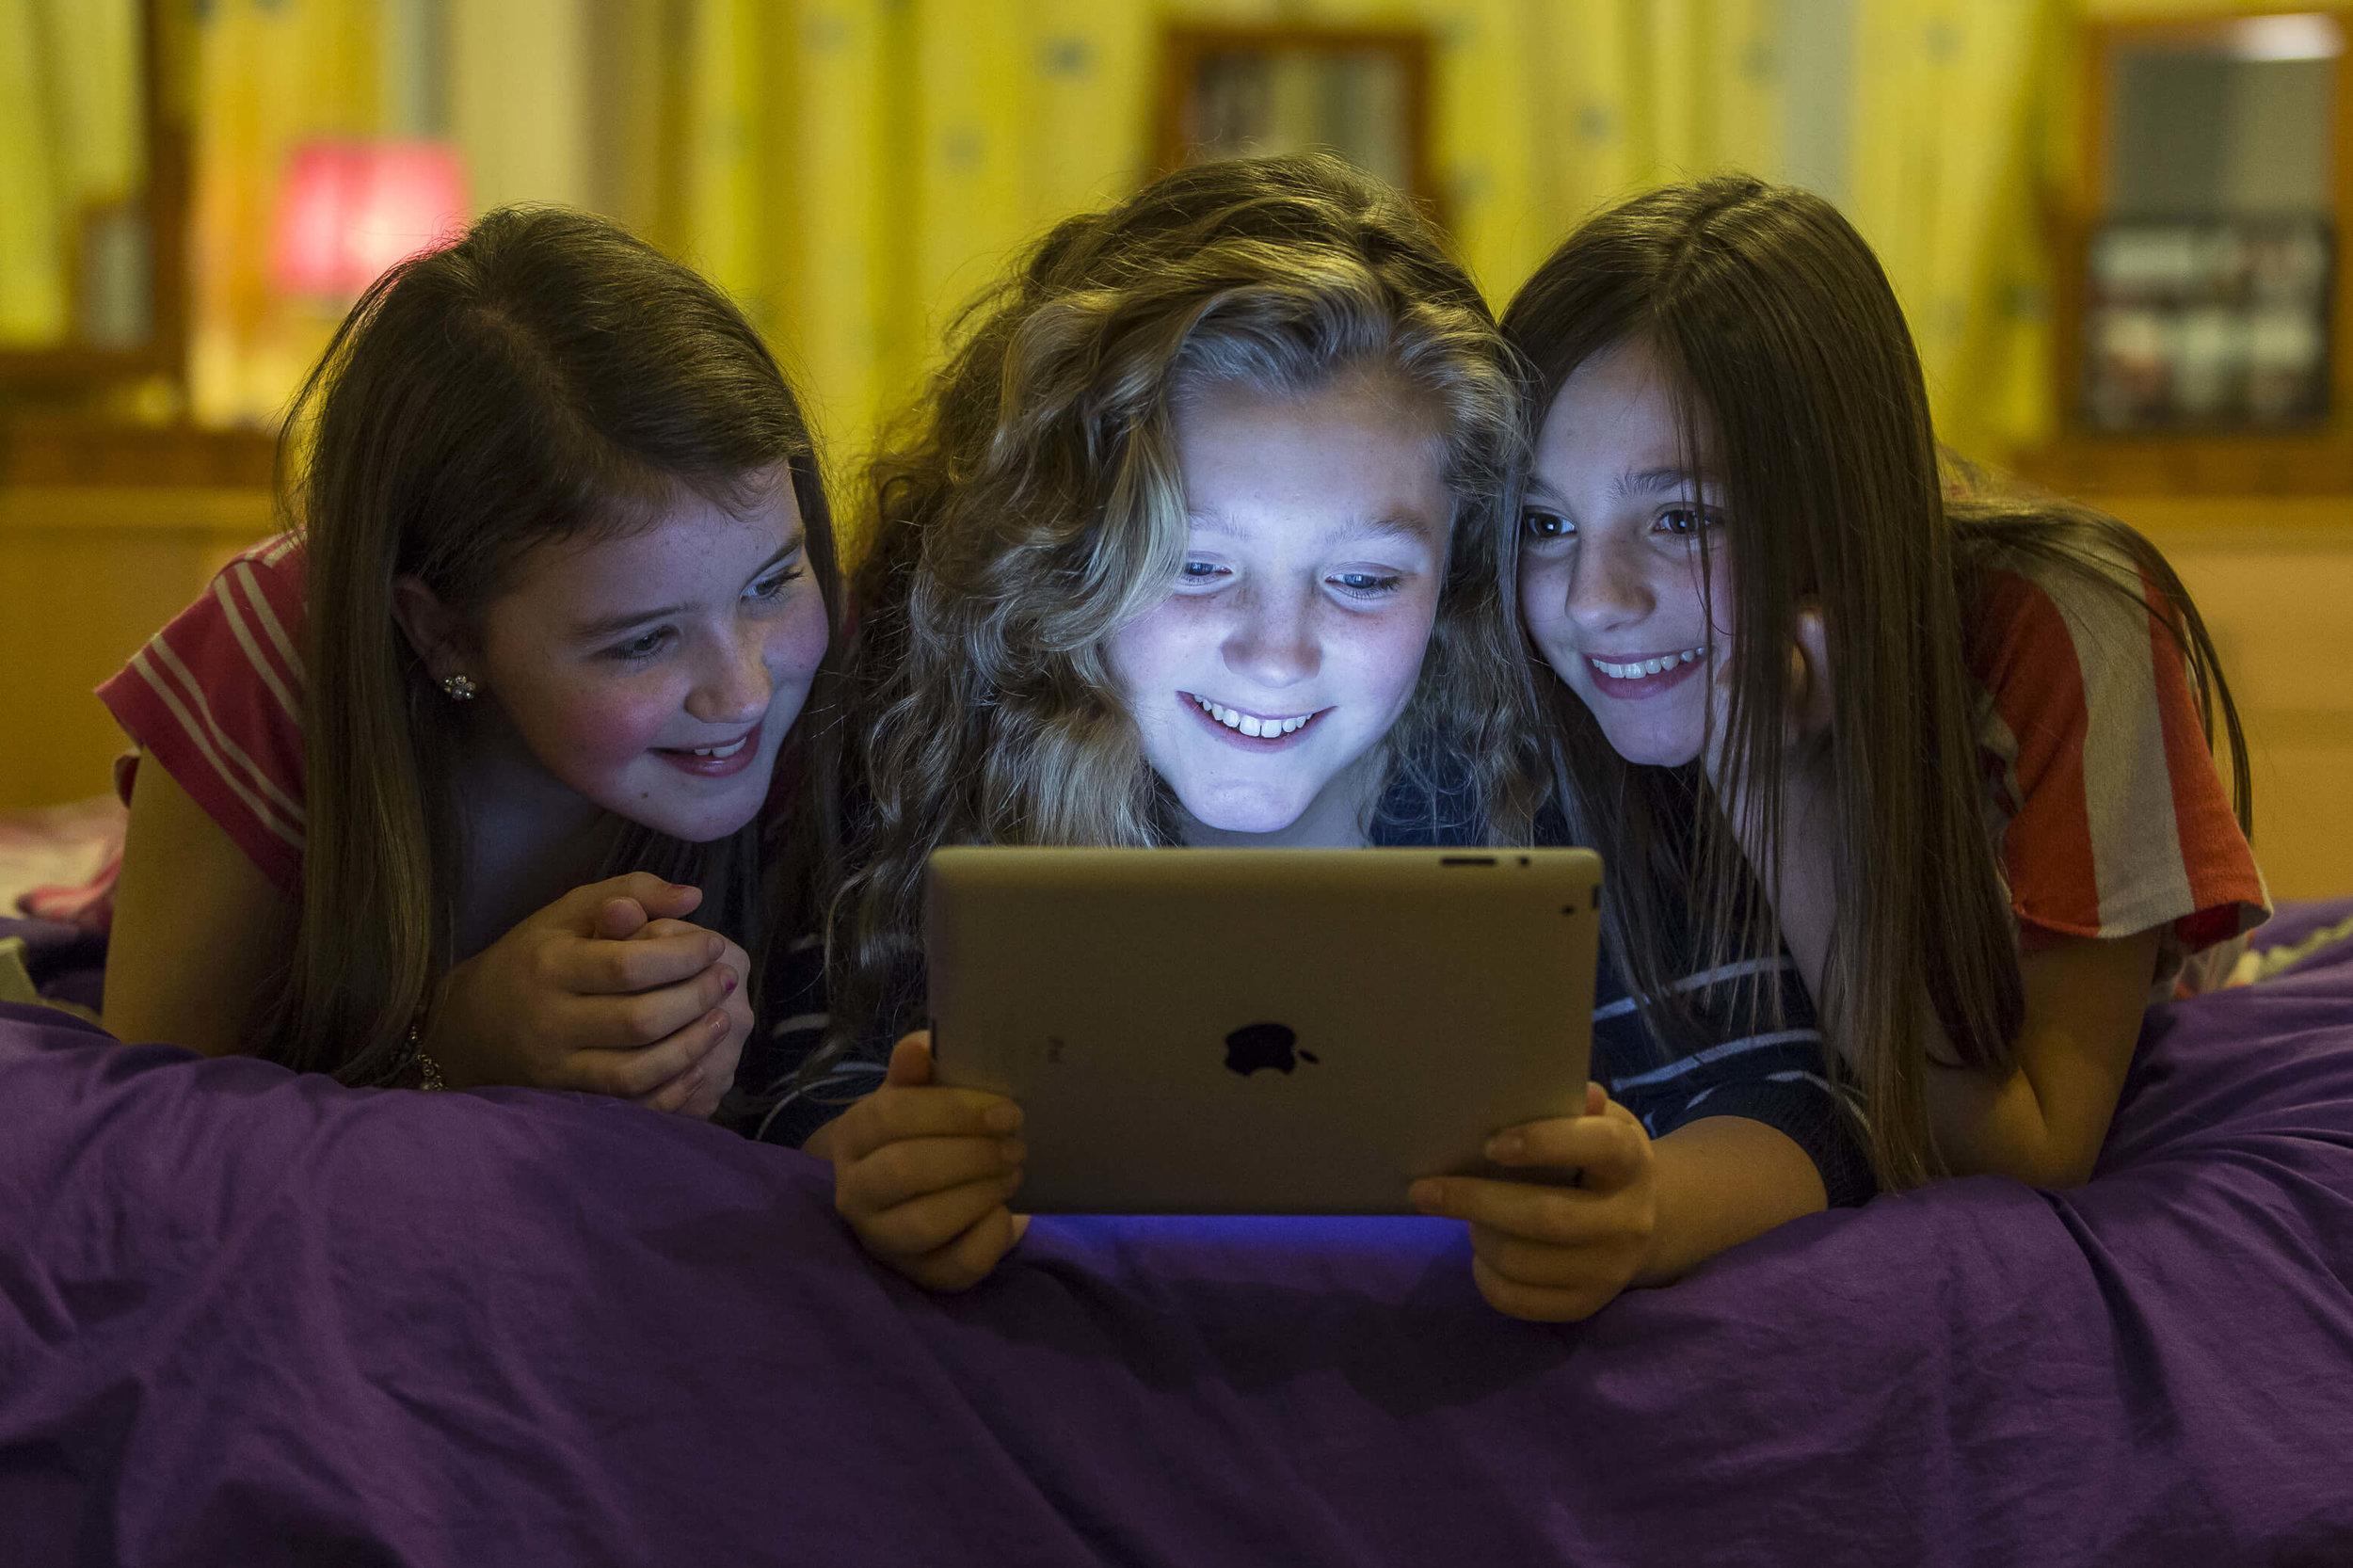 Friendship-iPad-166tny.jpg